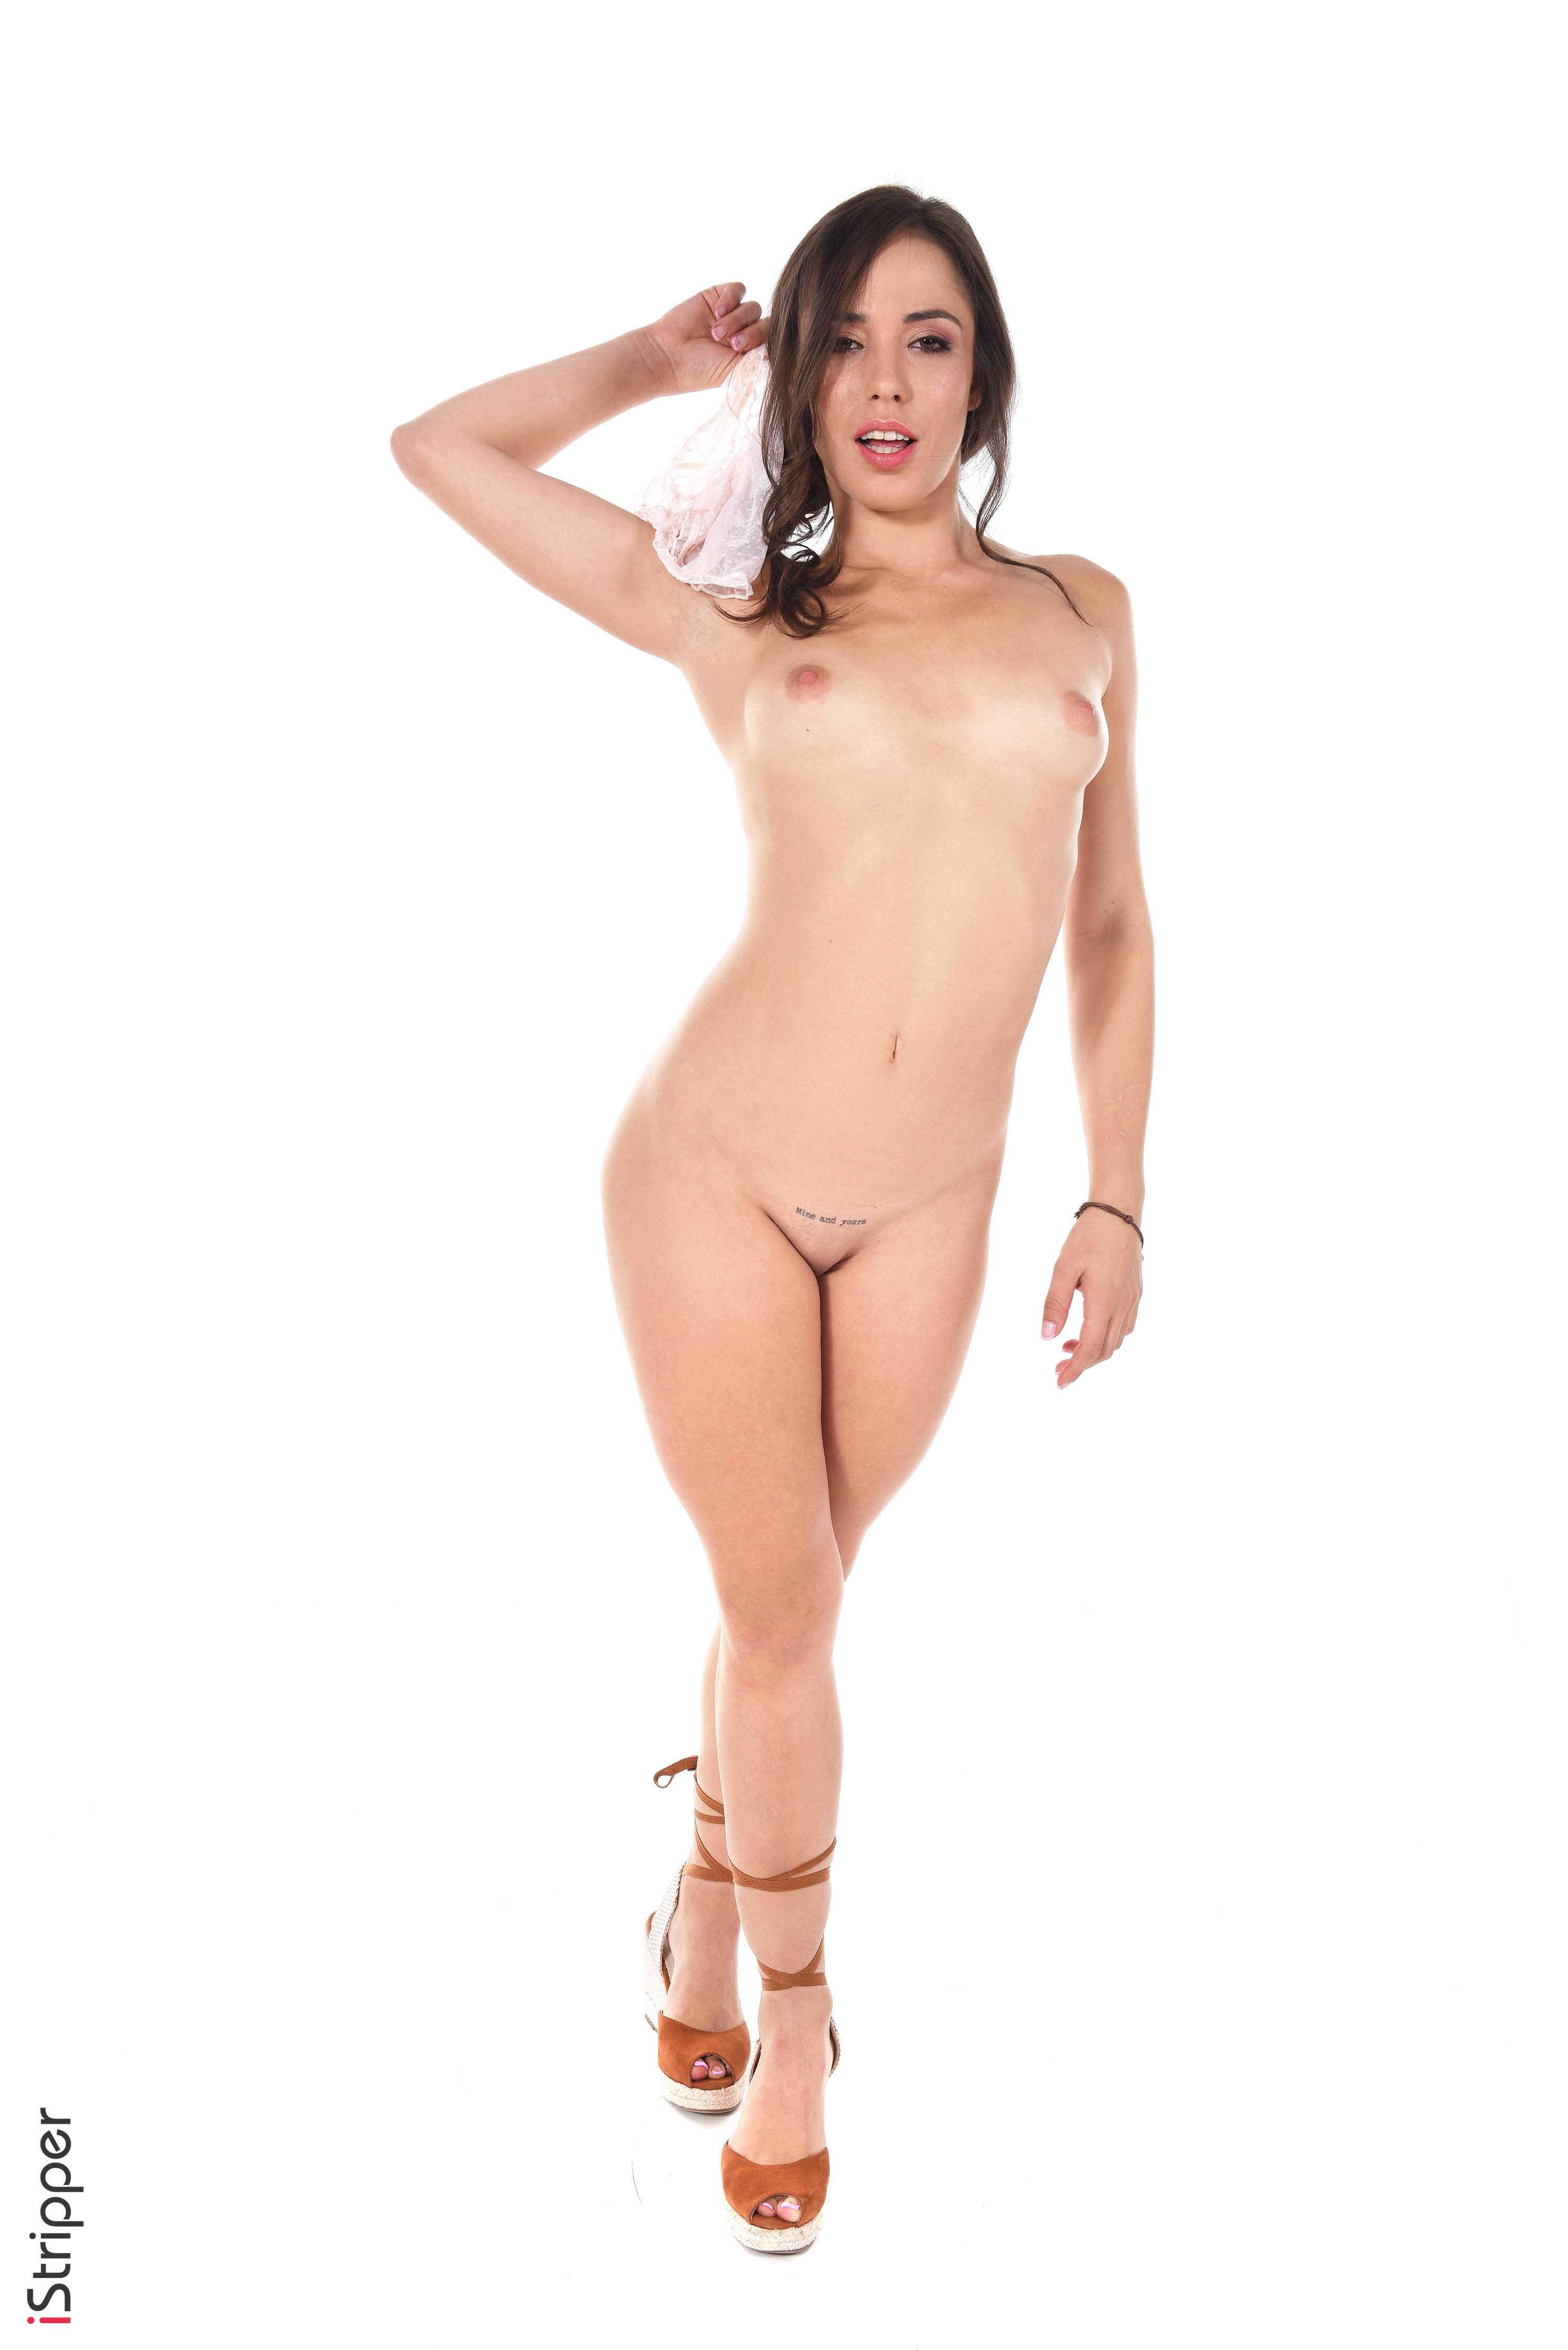 sexy Nude Girlies wallpaper